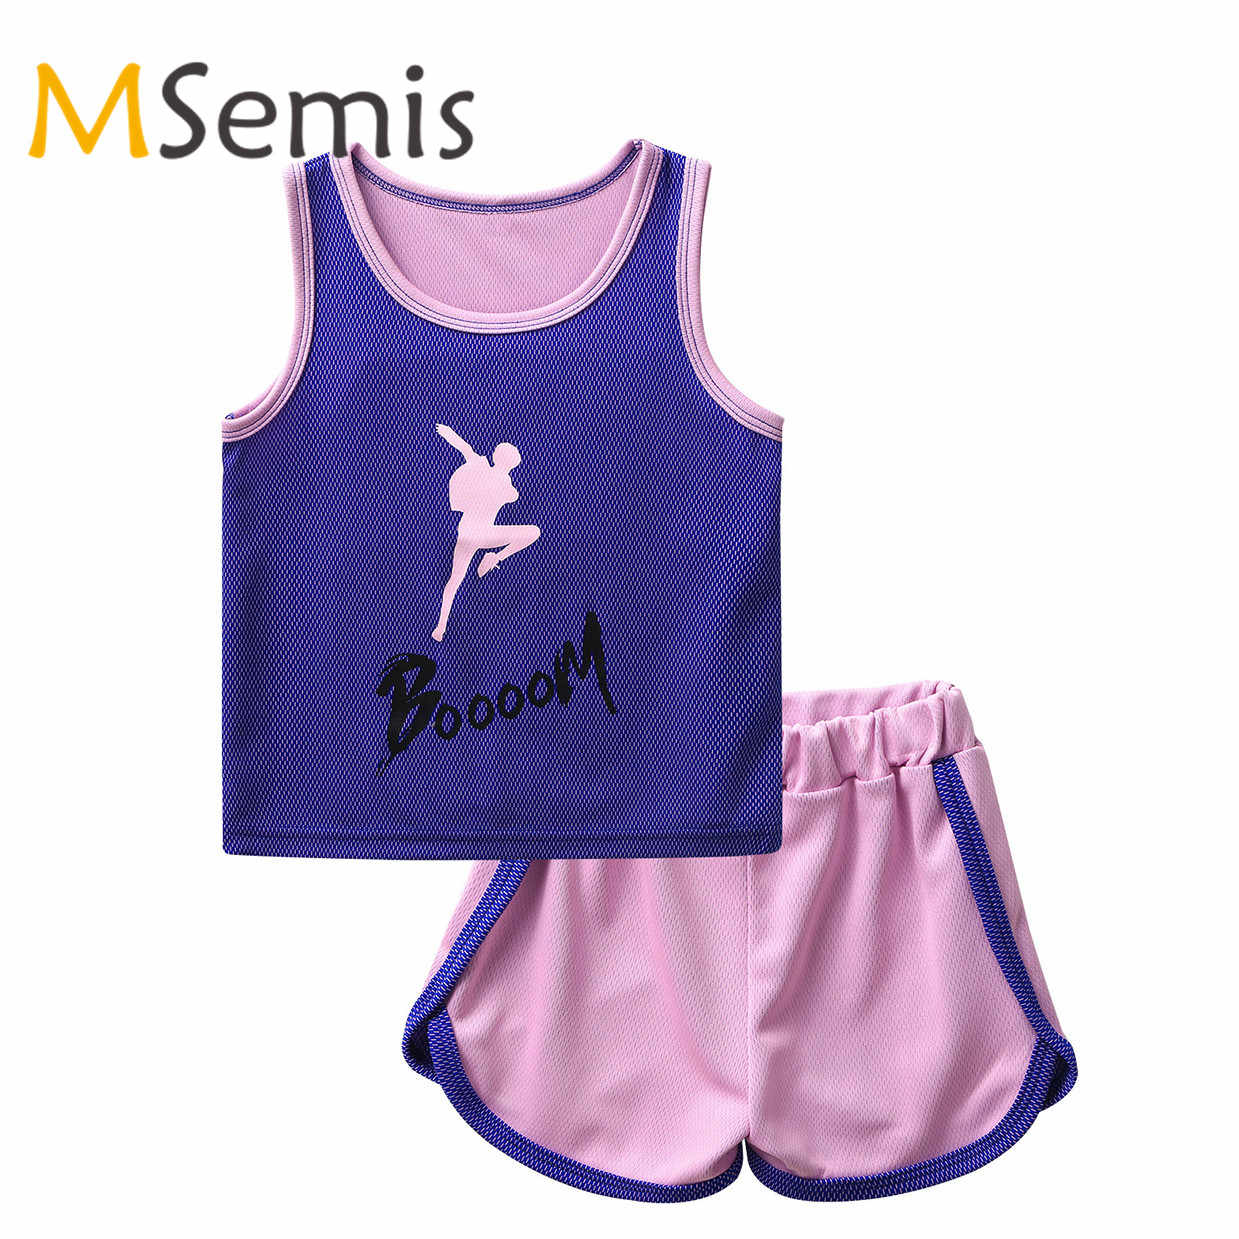 Kids Vest Childrens Running Training Gym Sports Breathable Sleeveless Tank Top